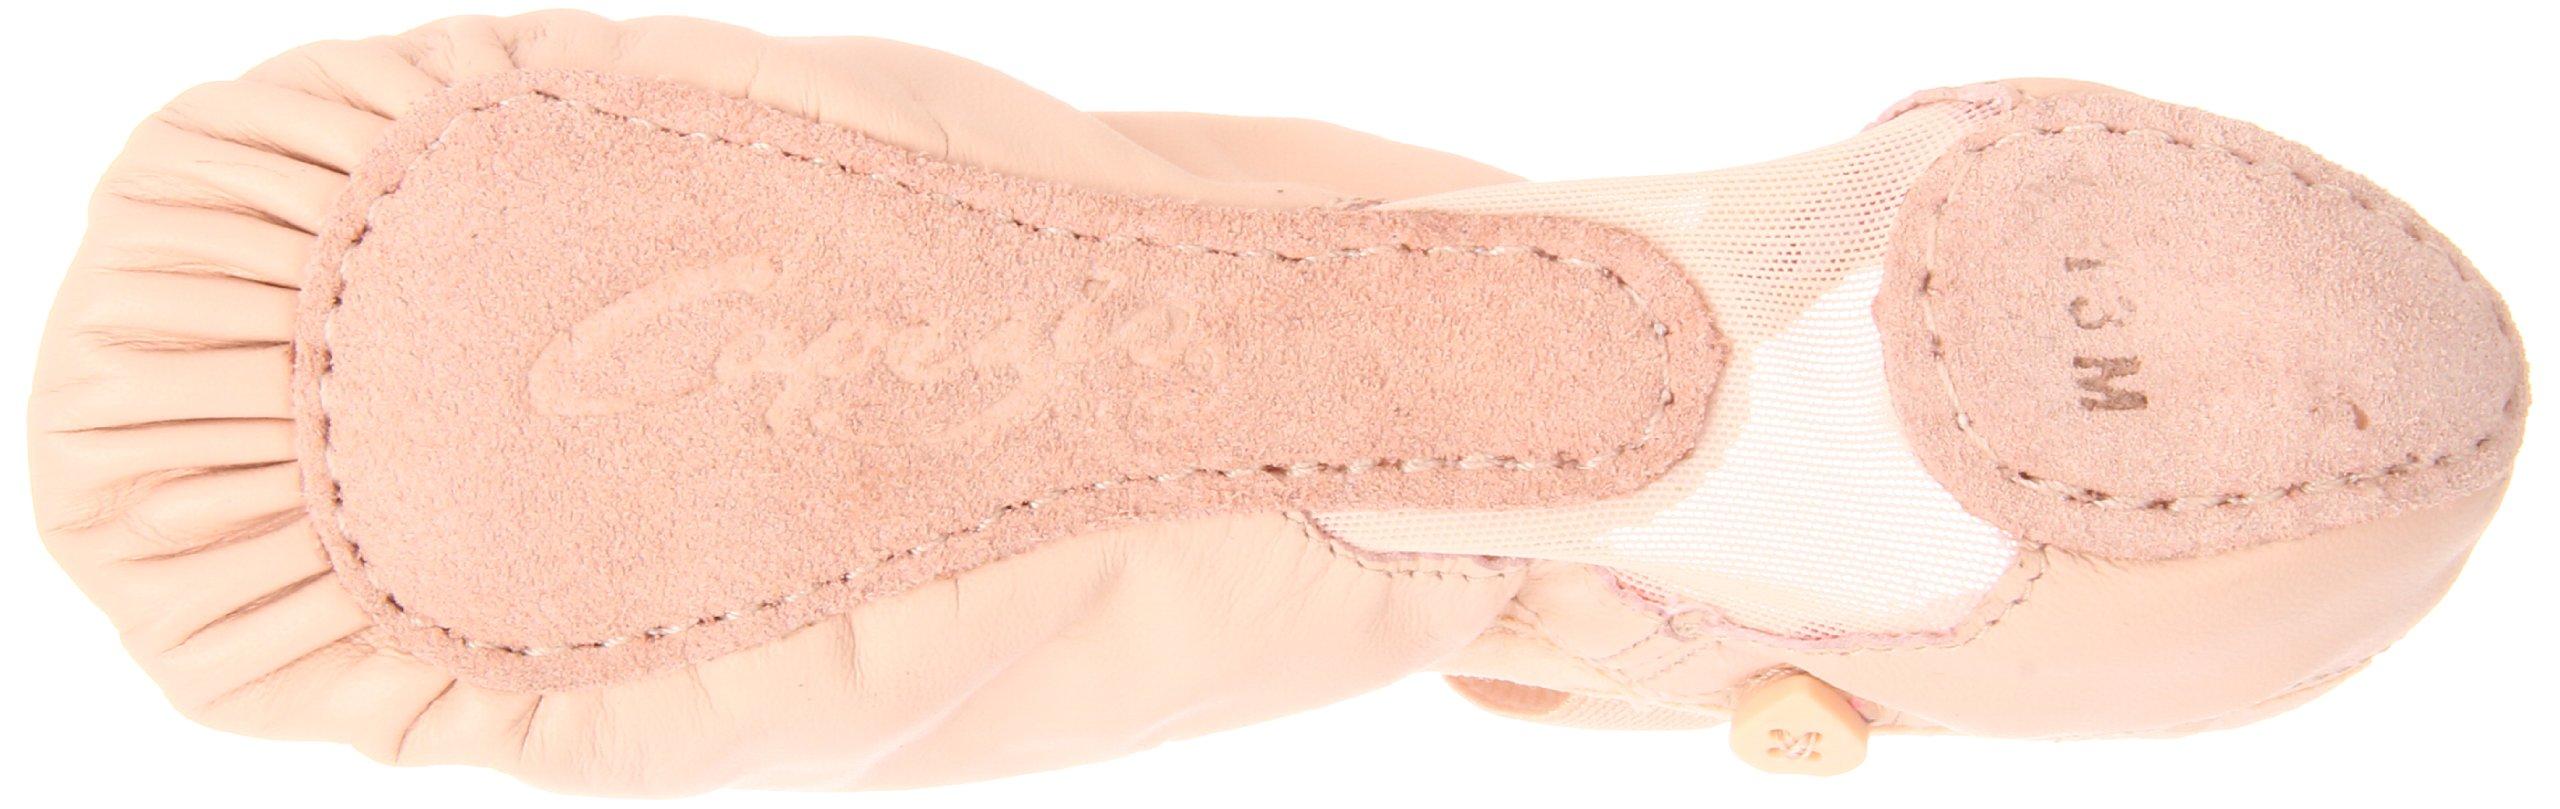 Capezio Love Ballet Flat (Toddler/Little Kid),Pink,1 M US Little Kid by Capezio (Image #3)